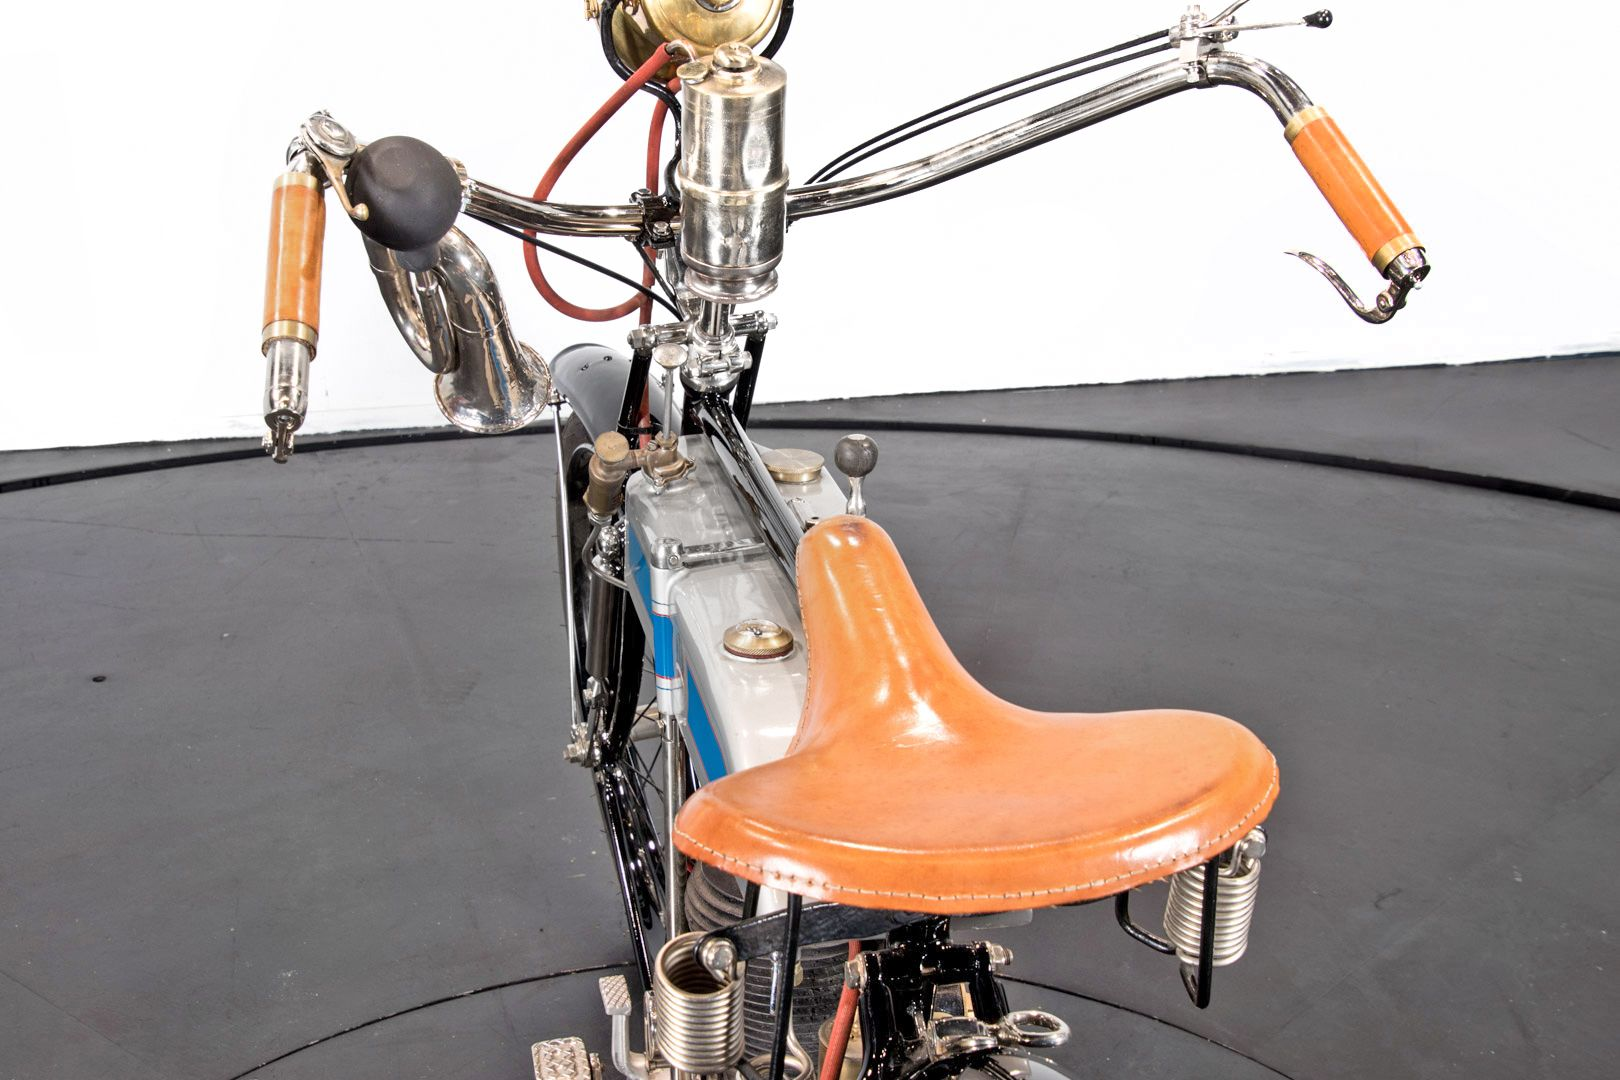 1916 Bianchi 500 40903